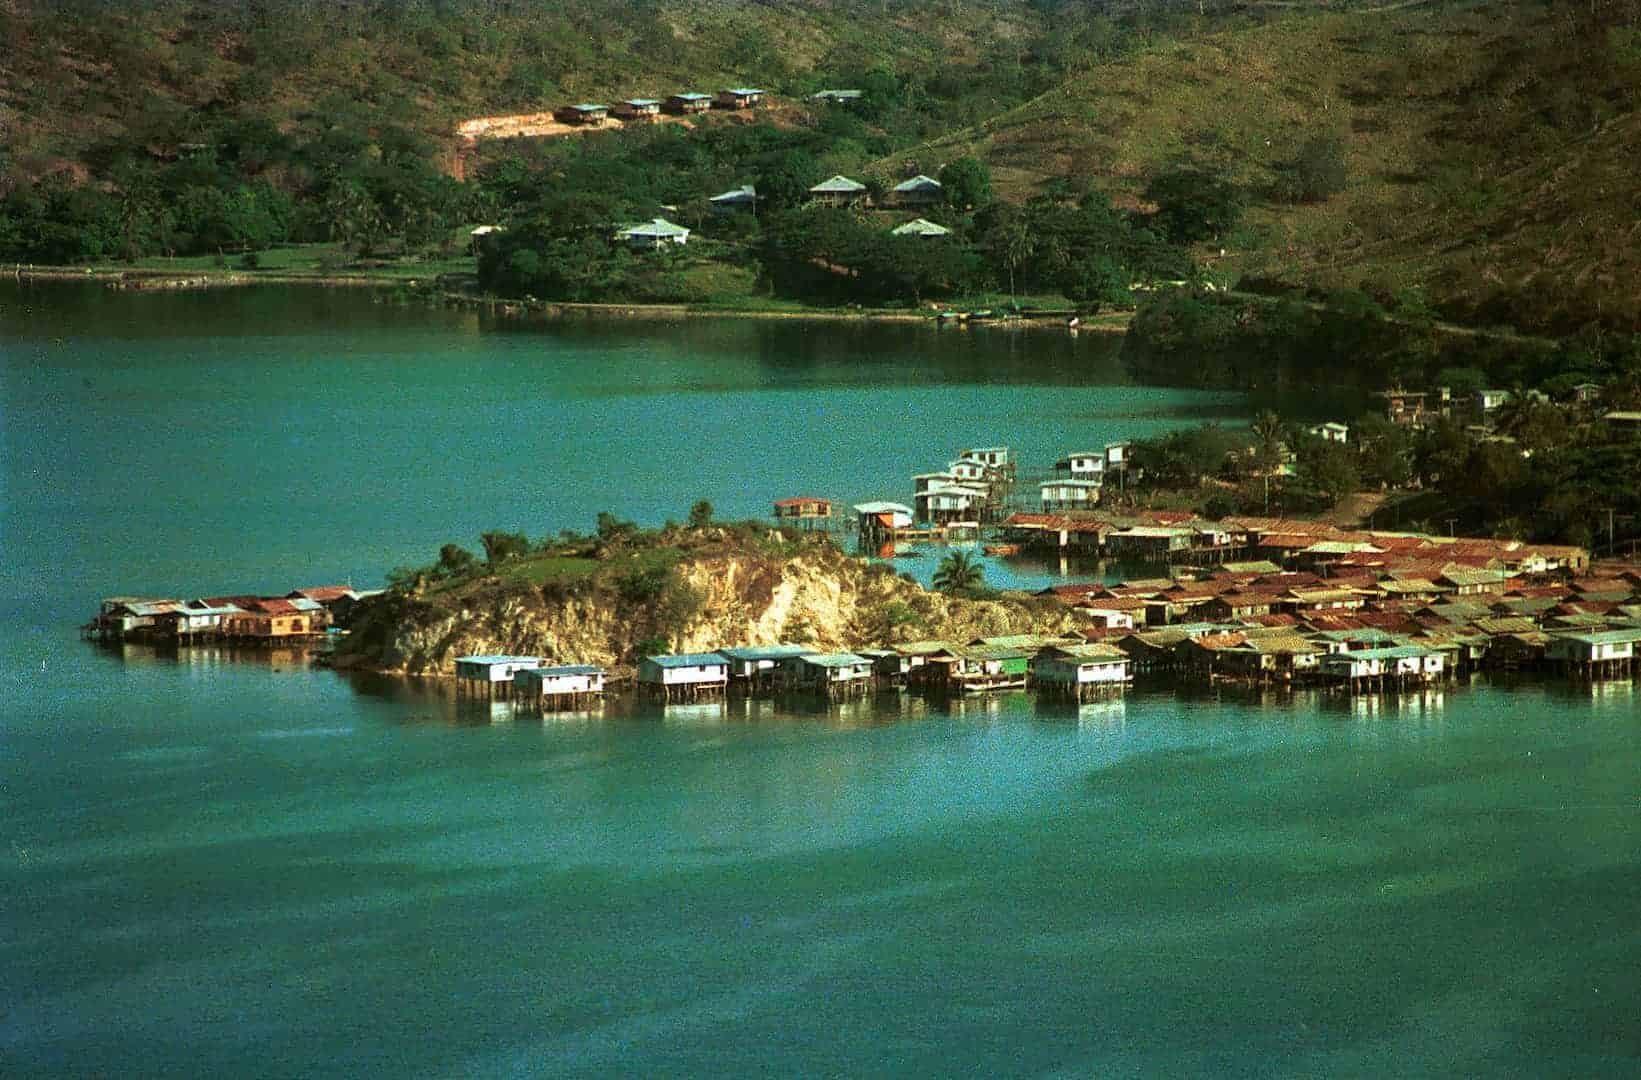 A Moresby Badilli